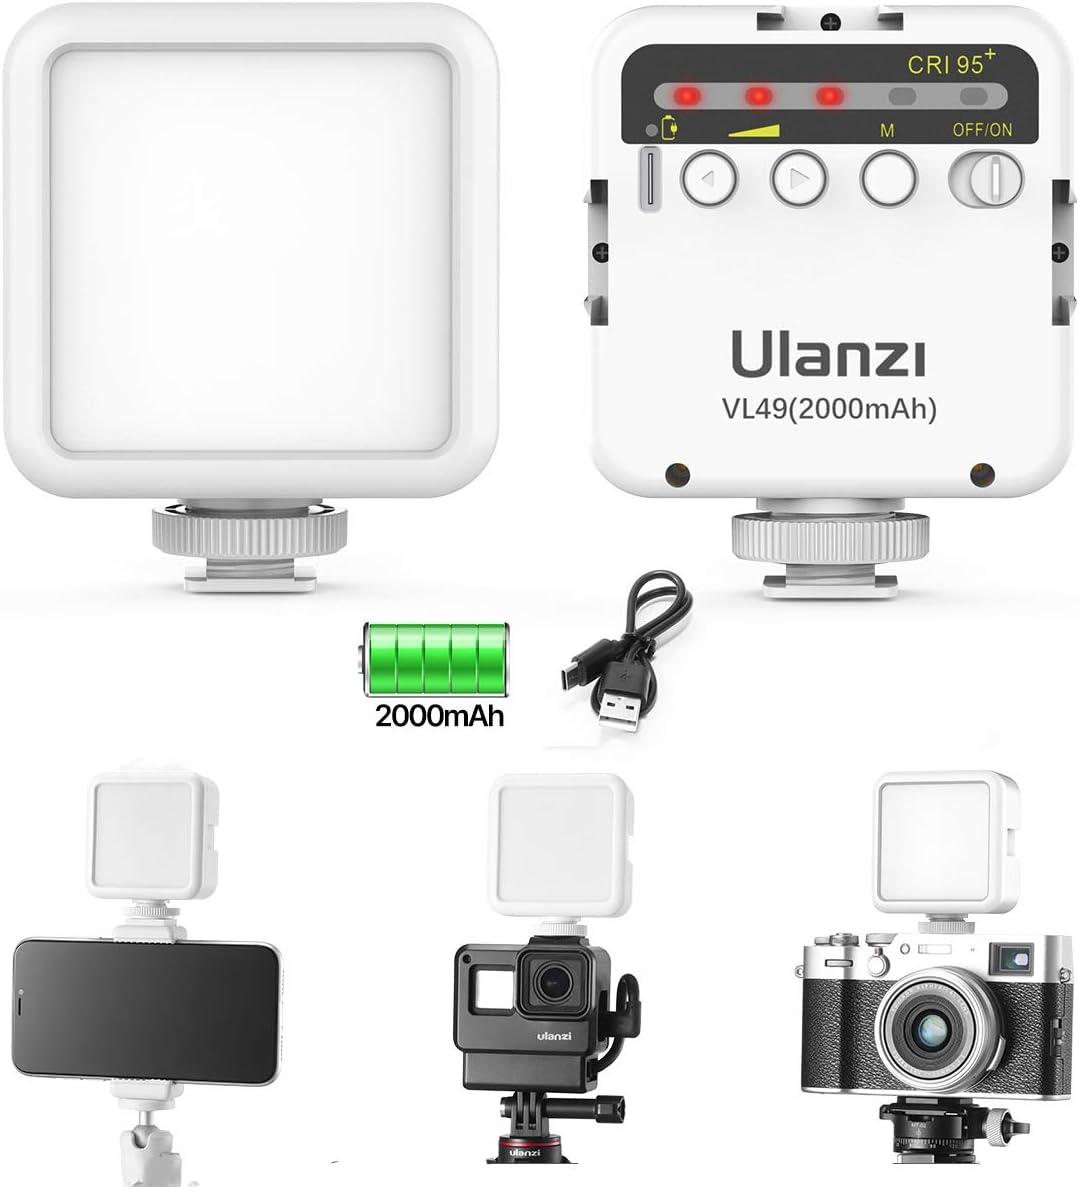 Ulanzi Vl49 2000 Mah Led Video Light Led Camera Light Camera Photo